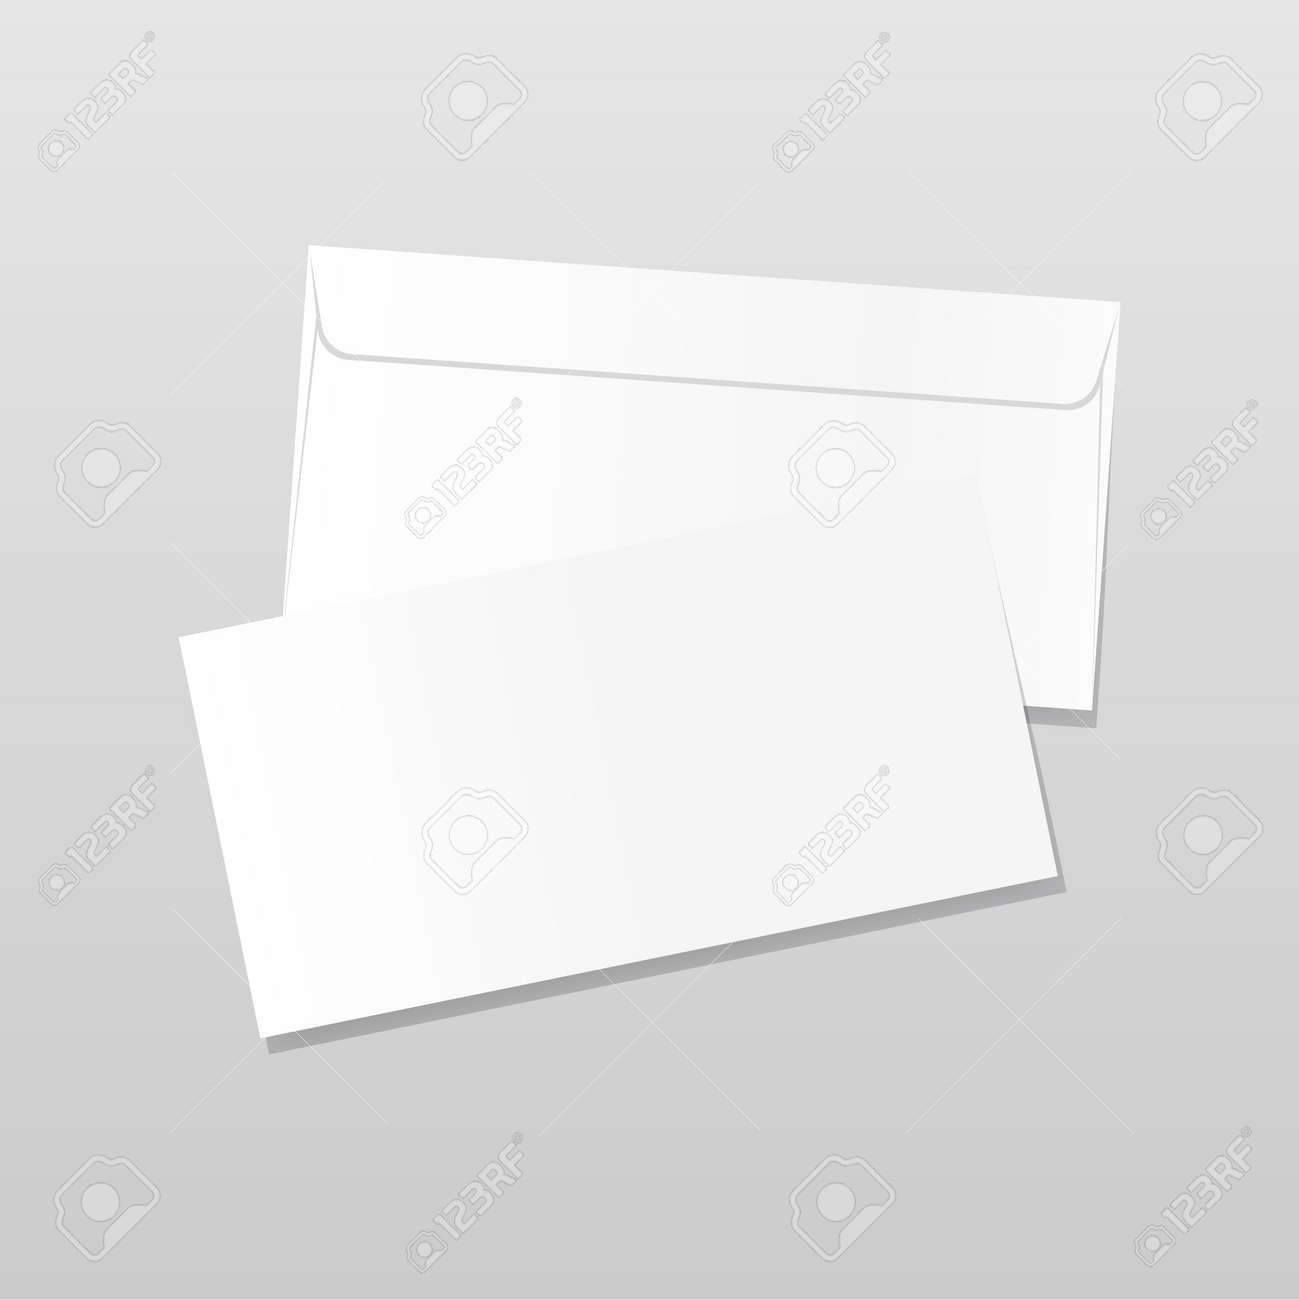 Front and back side envelope mock up. Realistic blank letter template. Paper C4 white envelopes. Vector illustration isolated on transparent background. - 169877666